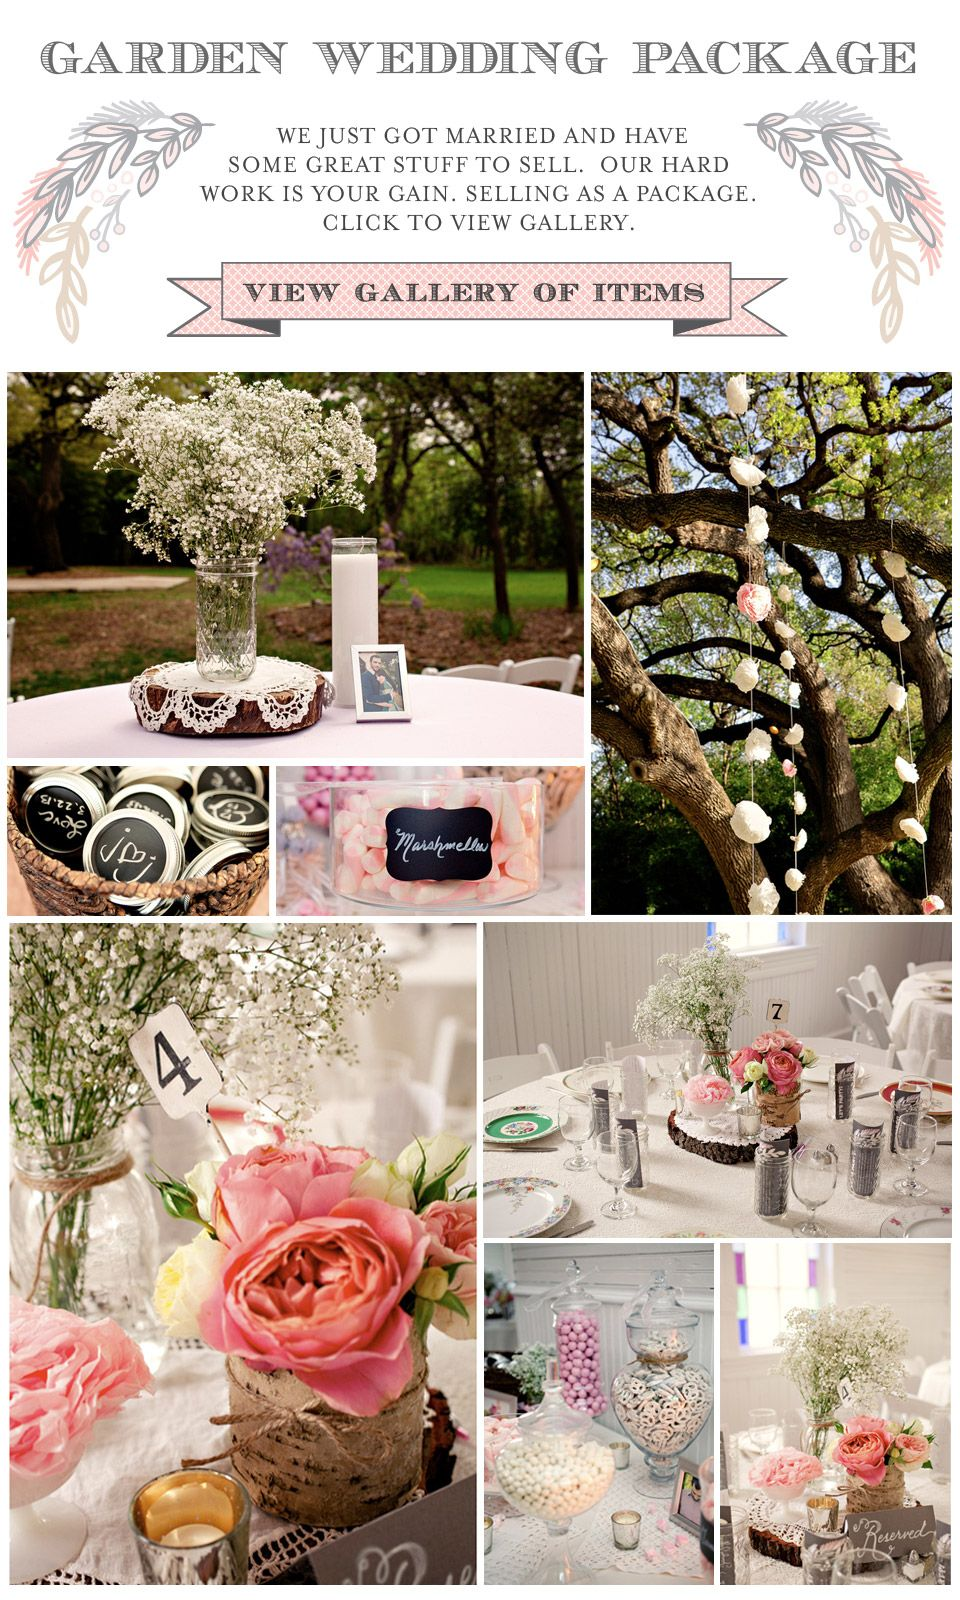 Vintage Garden Wedding Package Doilies Apothecary Jars Birchboxes For Sale Vintage Garden Wedding Wedding Table Settings Wedding Package